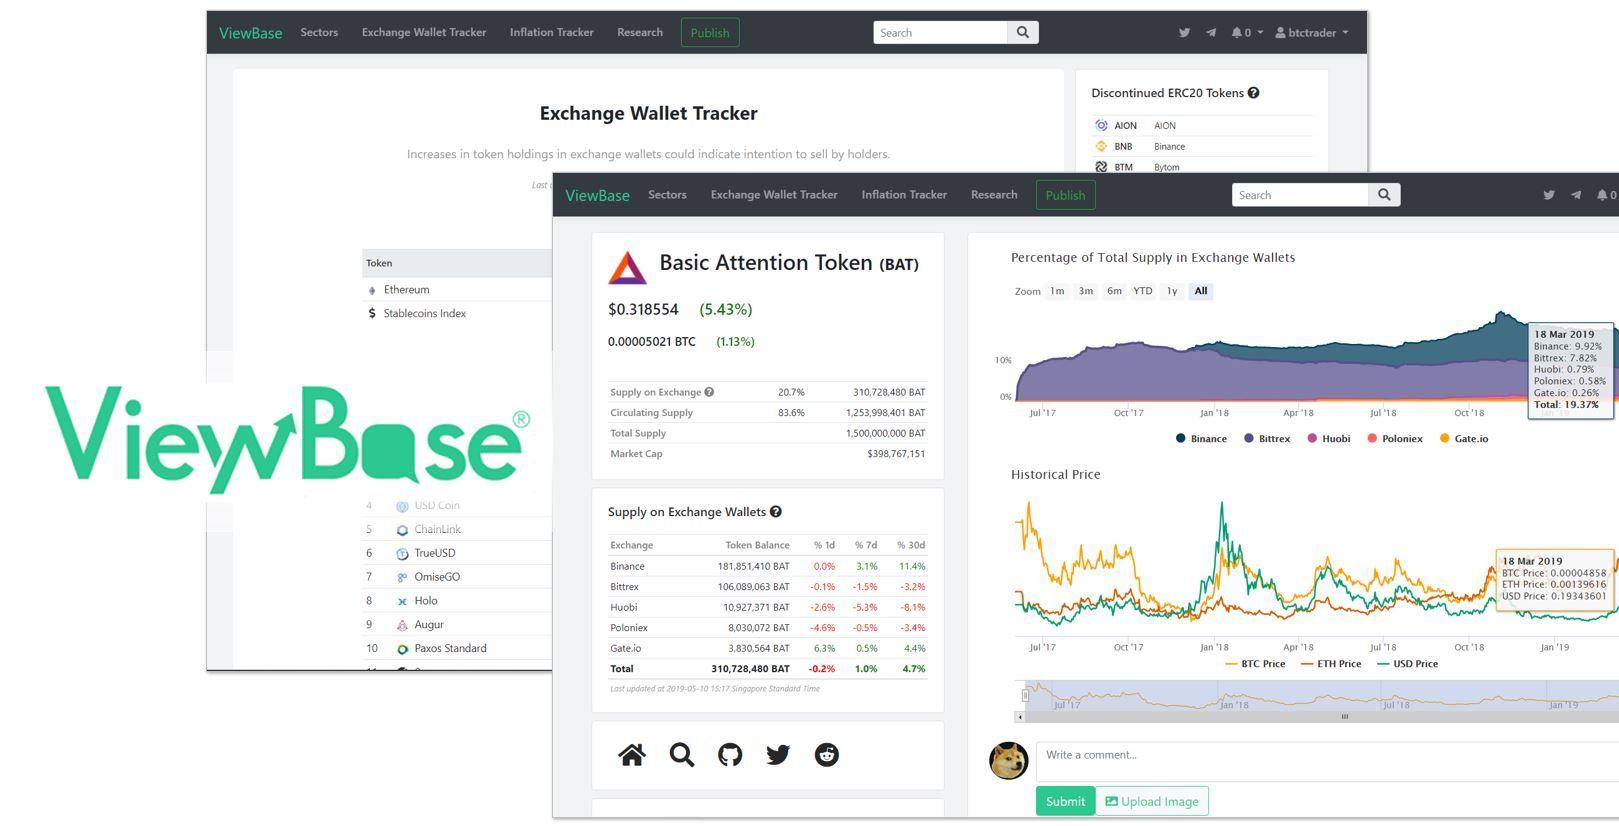 Exchange Wallet Tracker | ViewBase